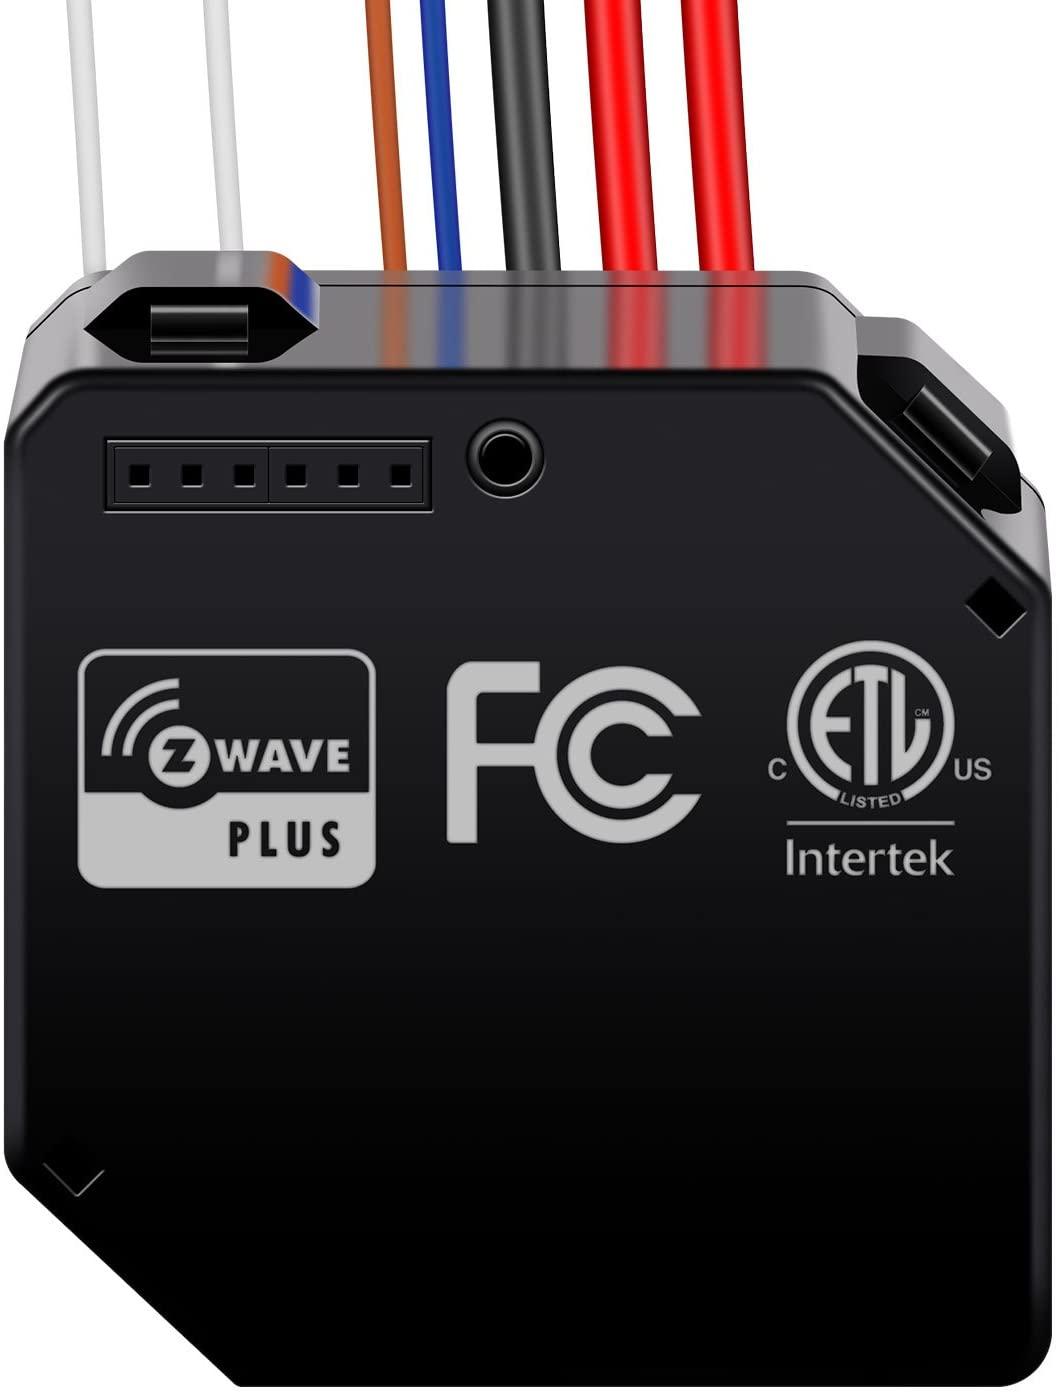 Enerwave ZWN-RSM2-PLUS Z-Wave Plus Switch Module, Dual Relay, Smart Hidden Switch, NEUTRAL WIRE REQUIRED, Black